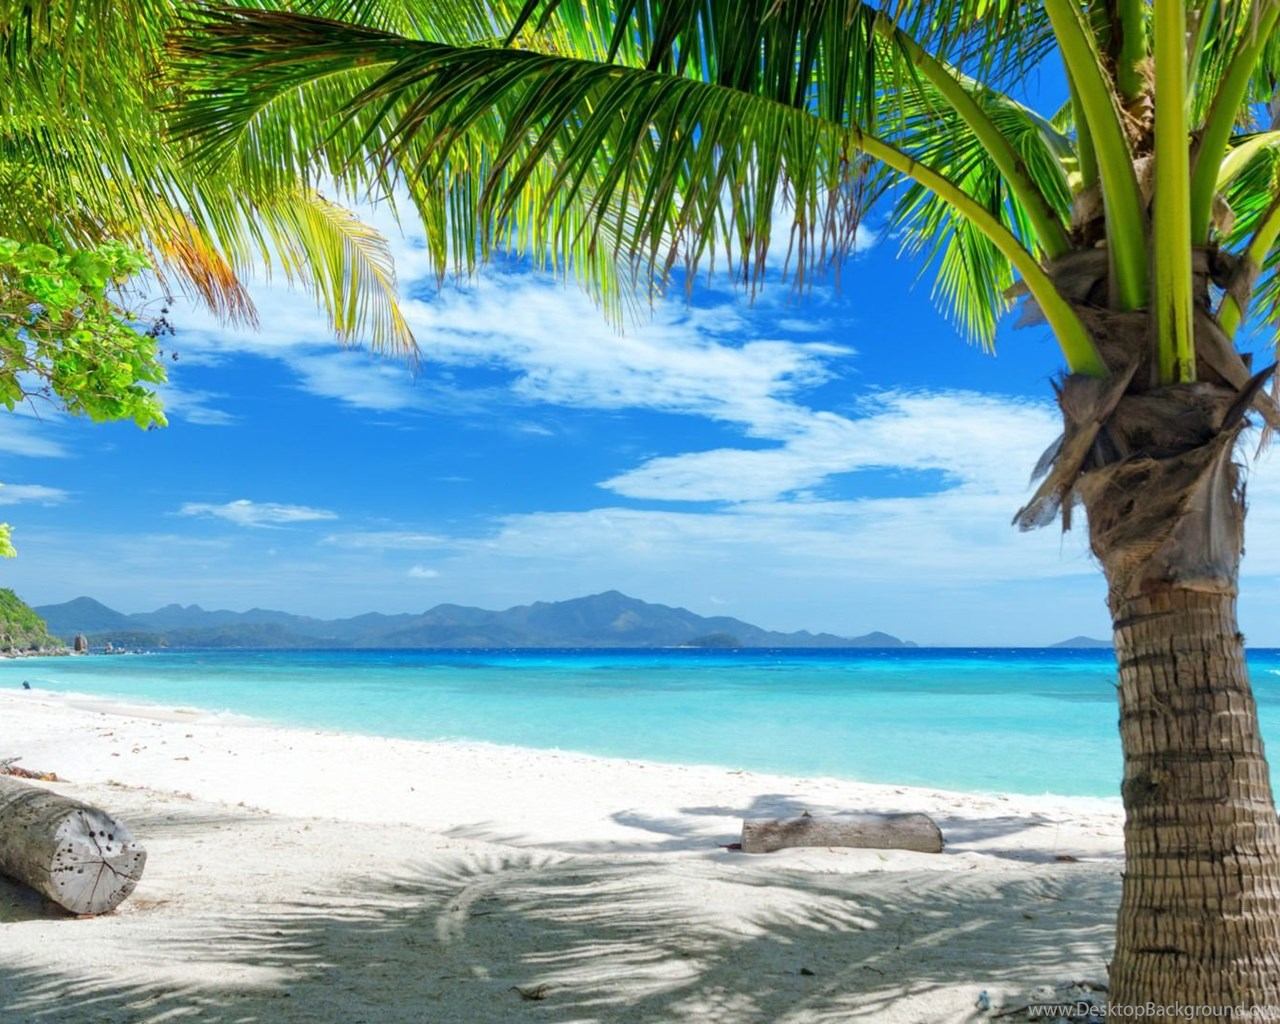 Hd Tropical Island Beach Paradise Wallpapers And Backgrounds: Tropical Beach Backgrounds For Desktop 5.jpg Desktop